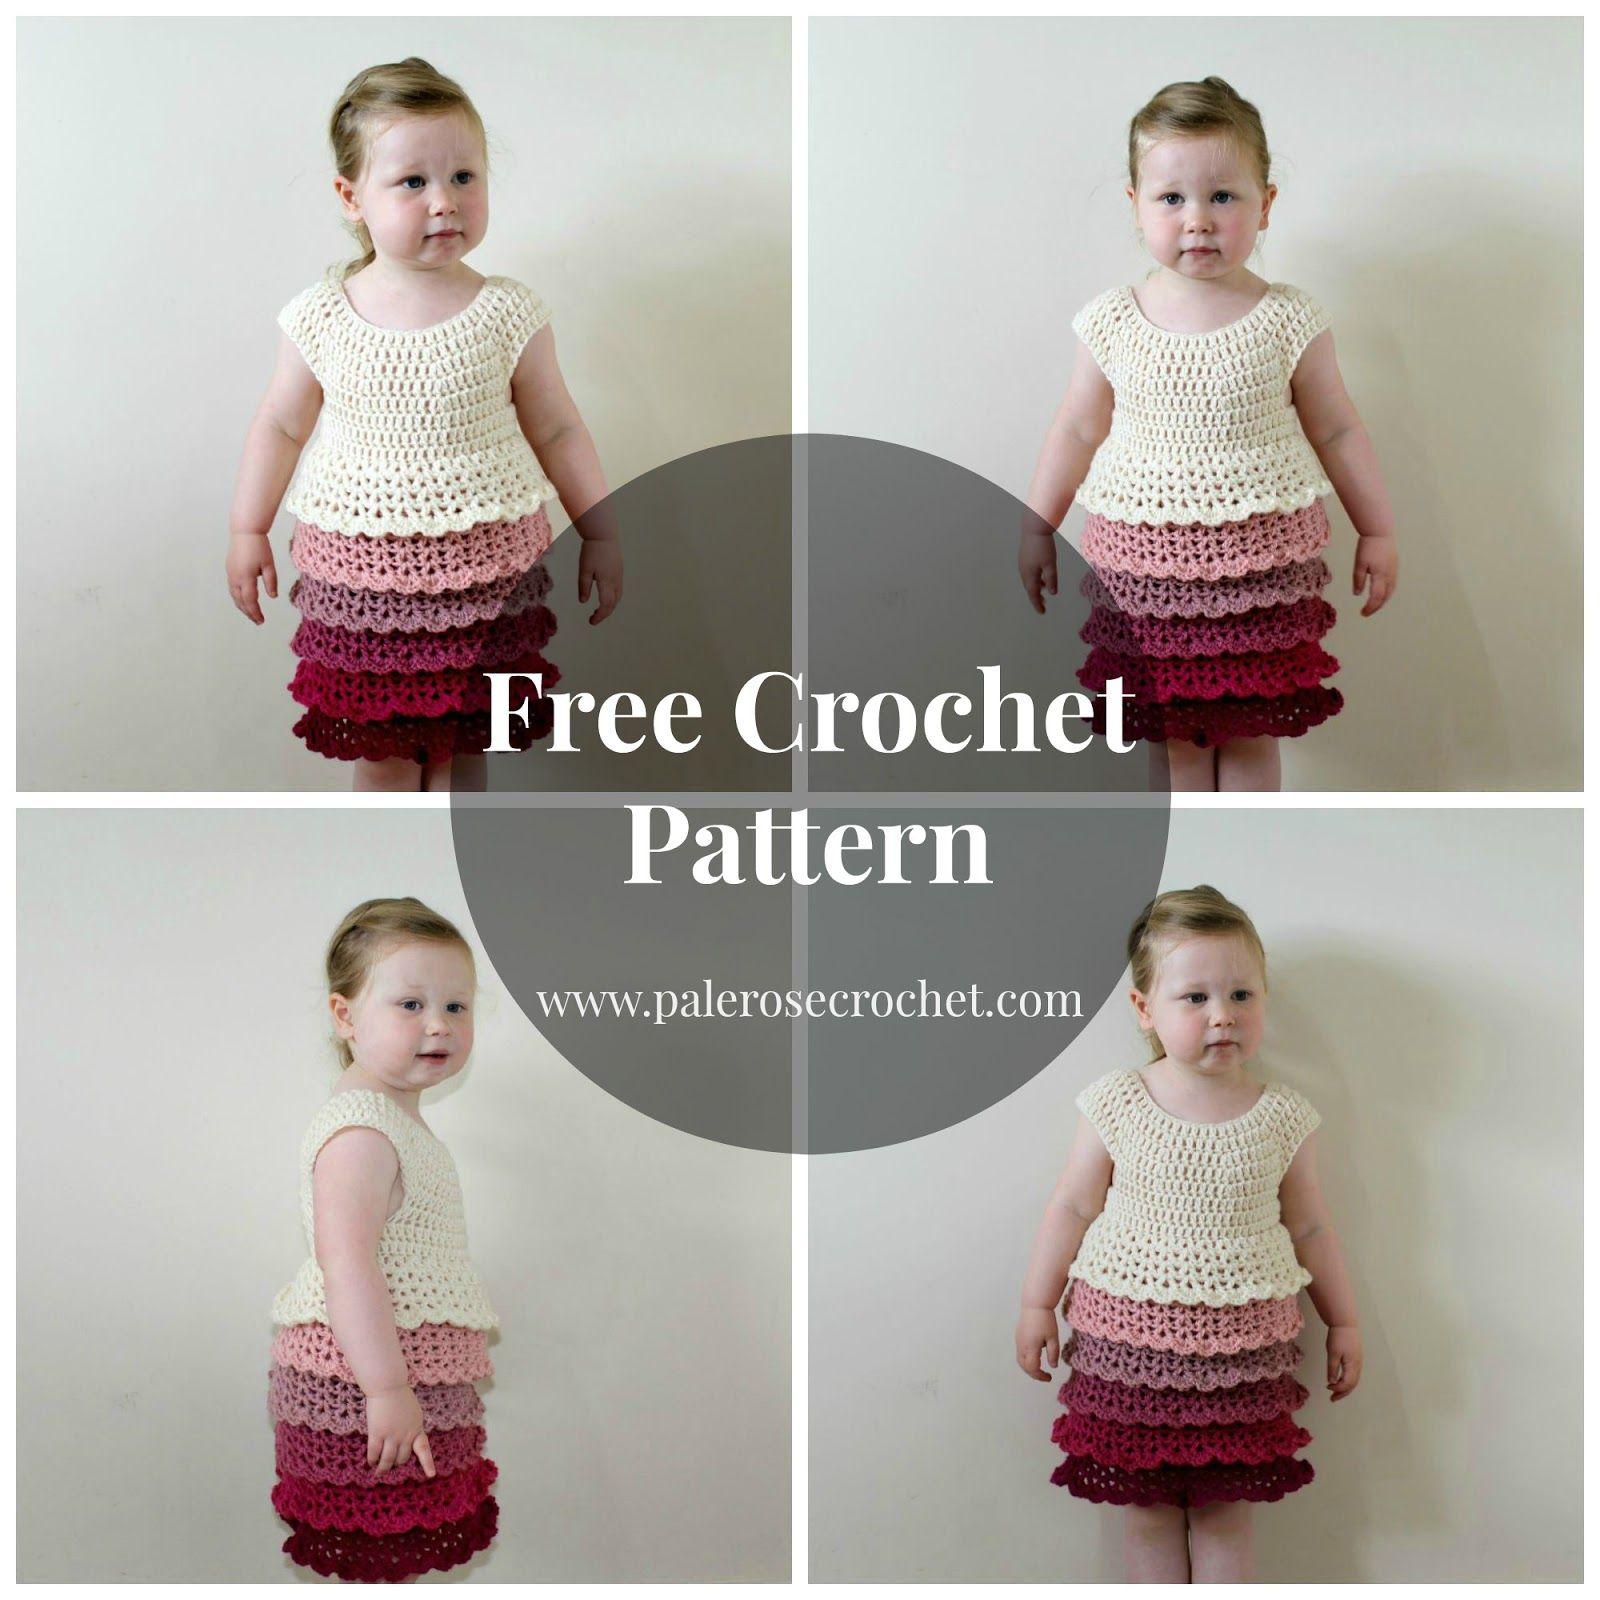 A crochet blog focusing on free crochet patterns and easy crochet ...